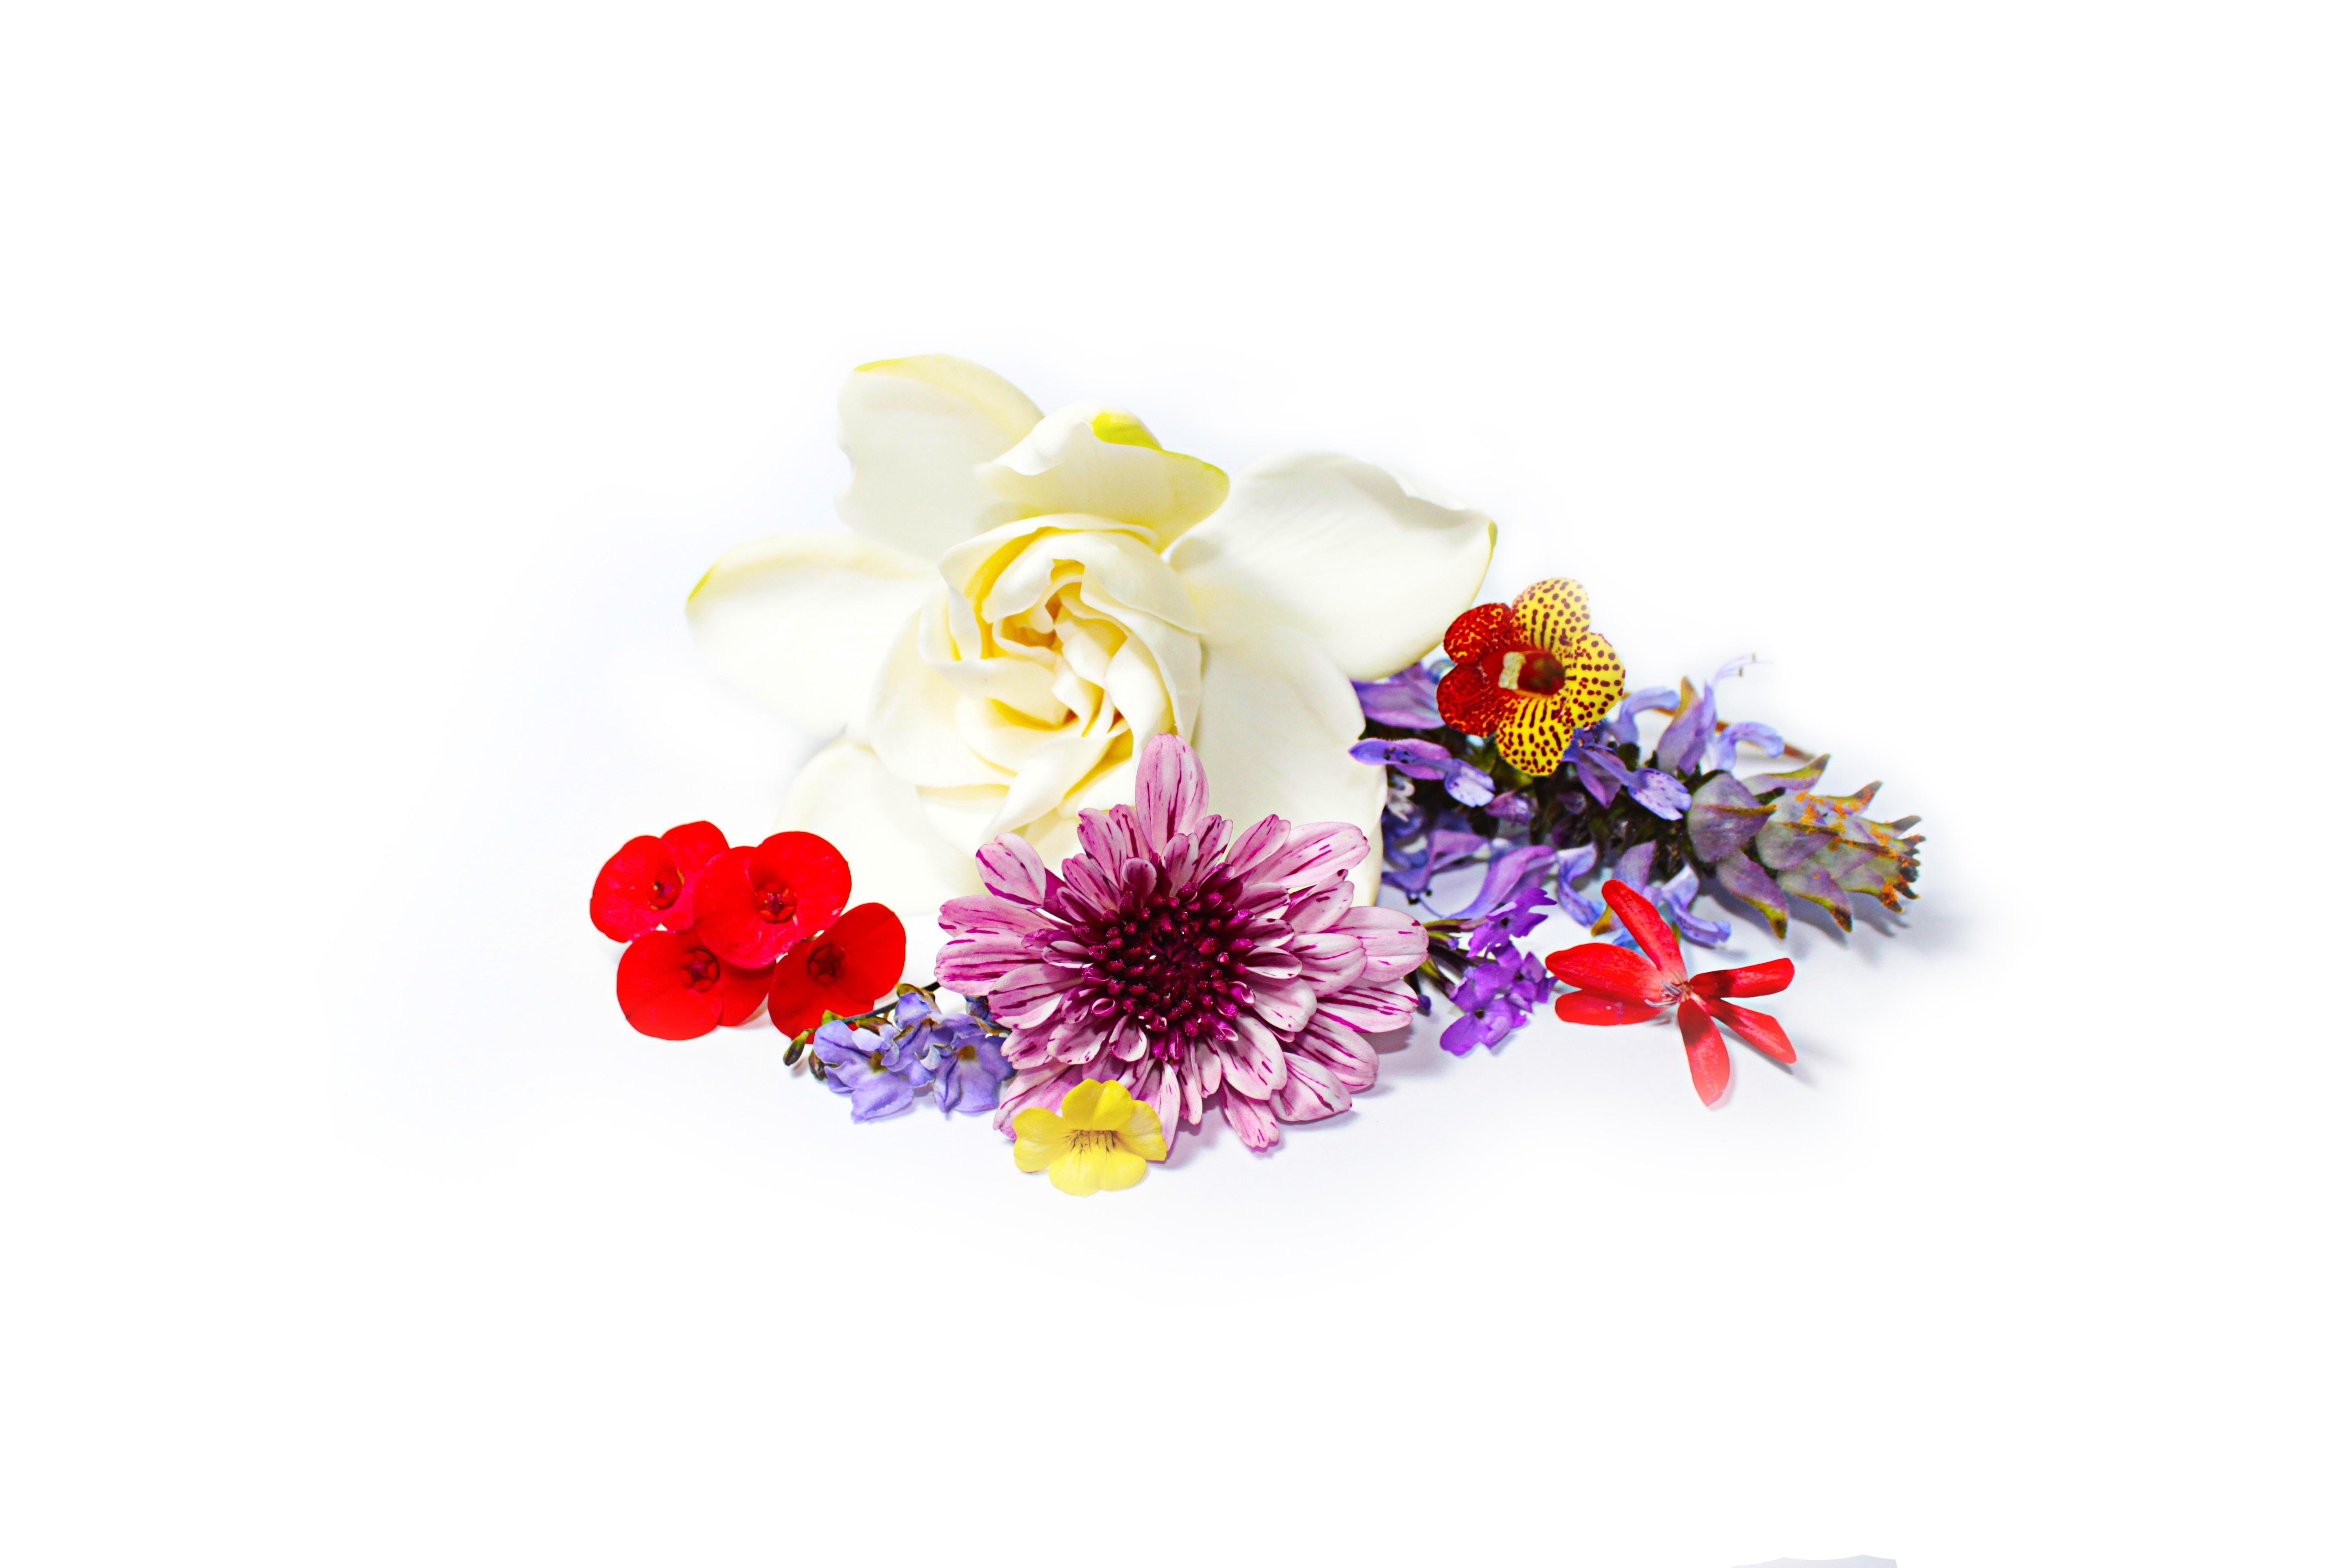 assorted-color flowers digital wallpaper